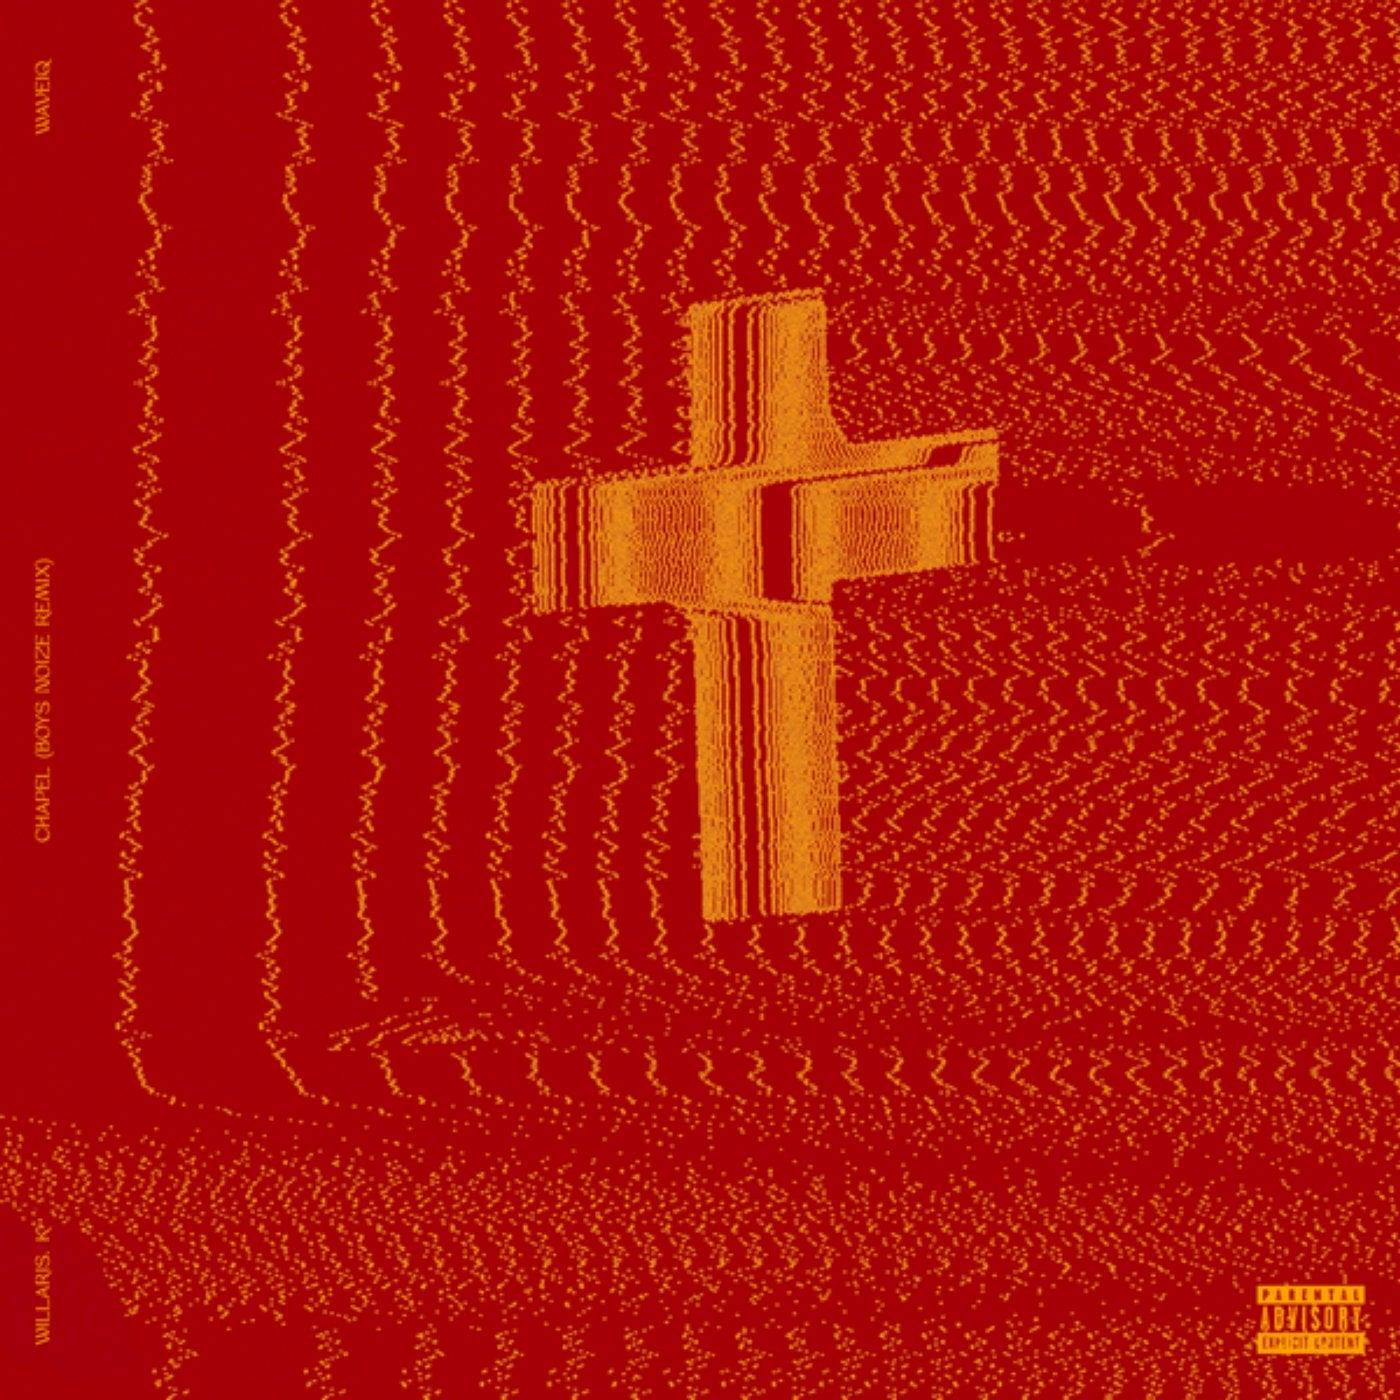 Chapel (Boys Noize Remix)